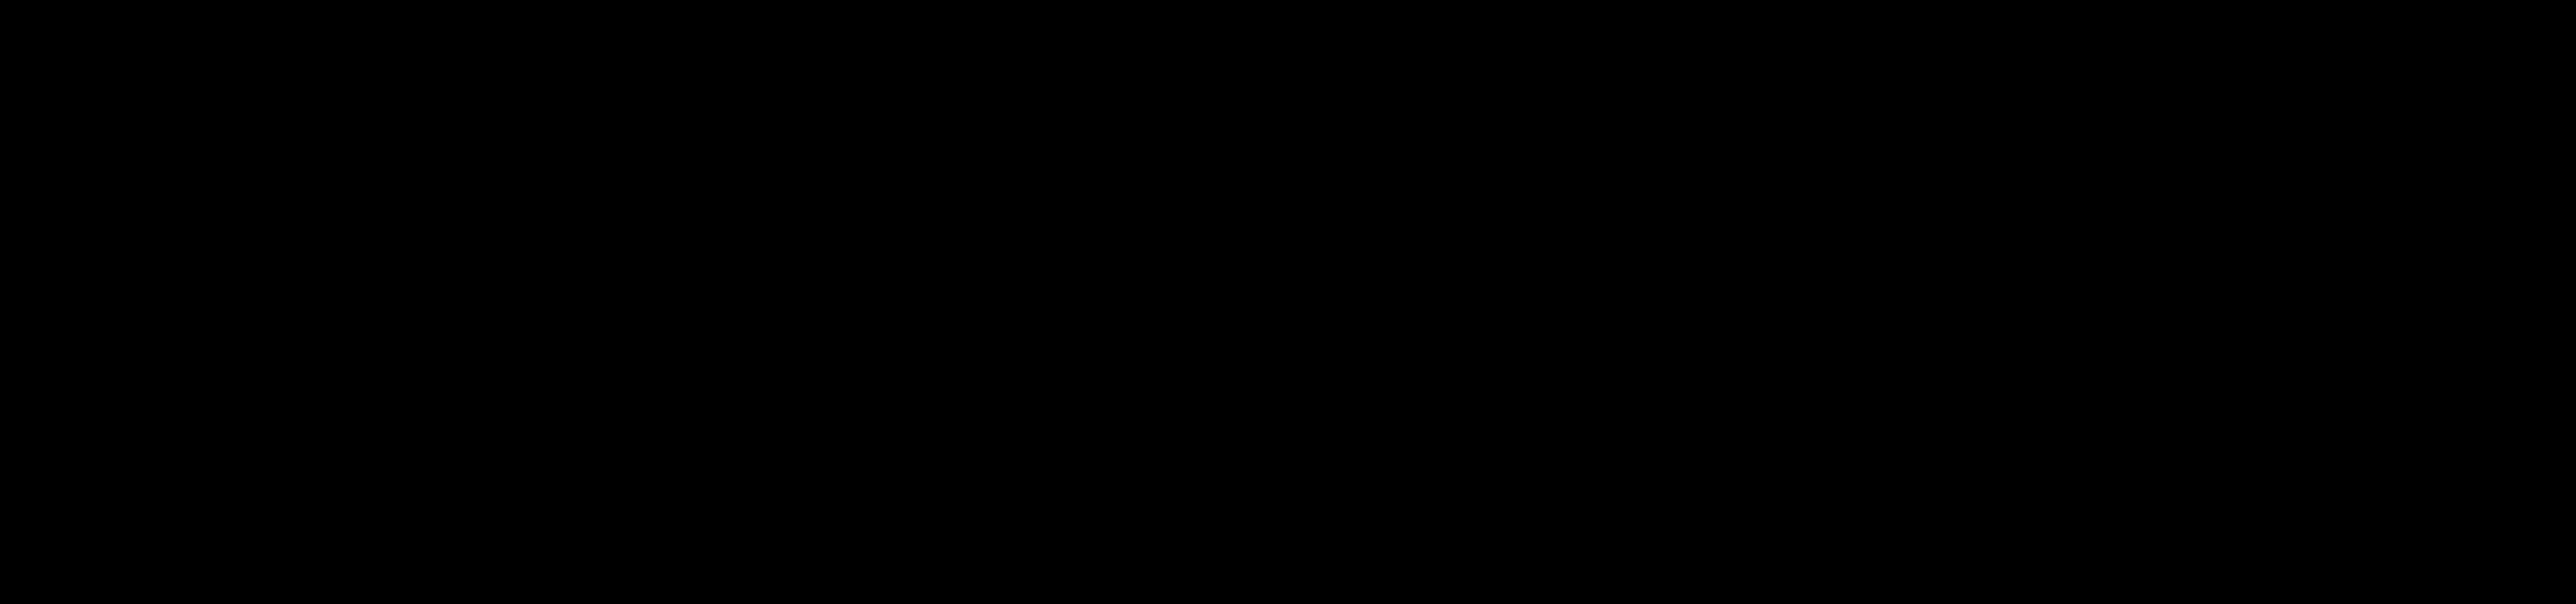 EK-DOS